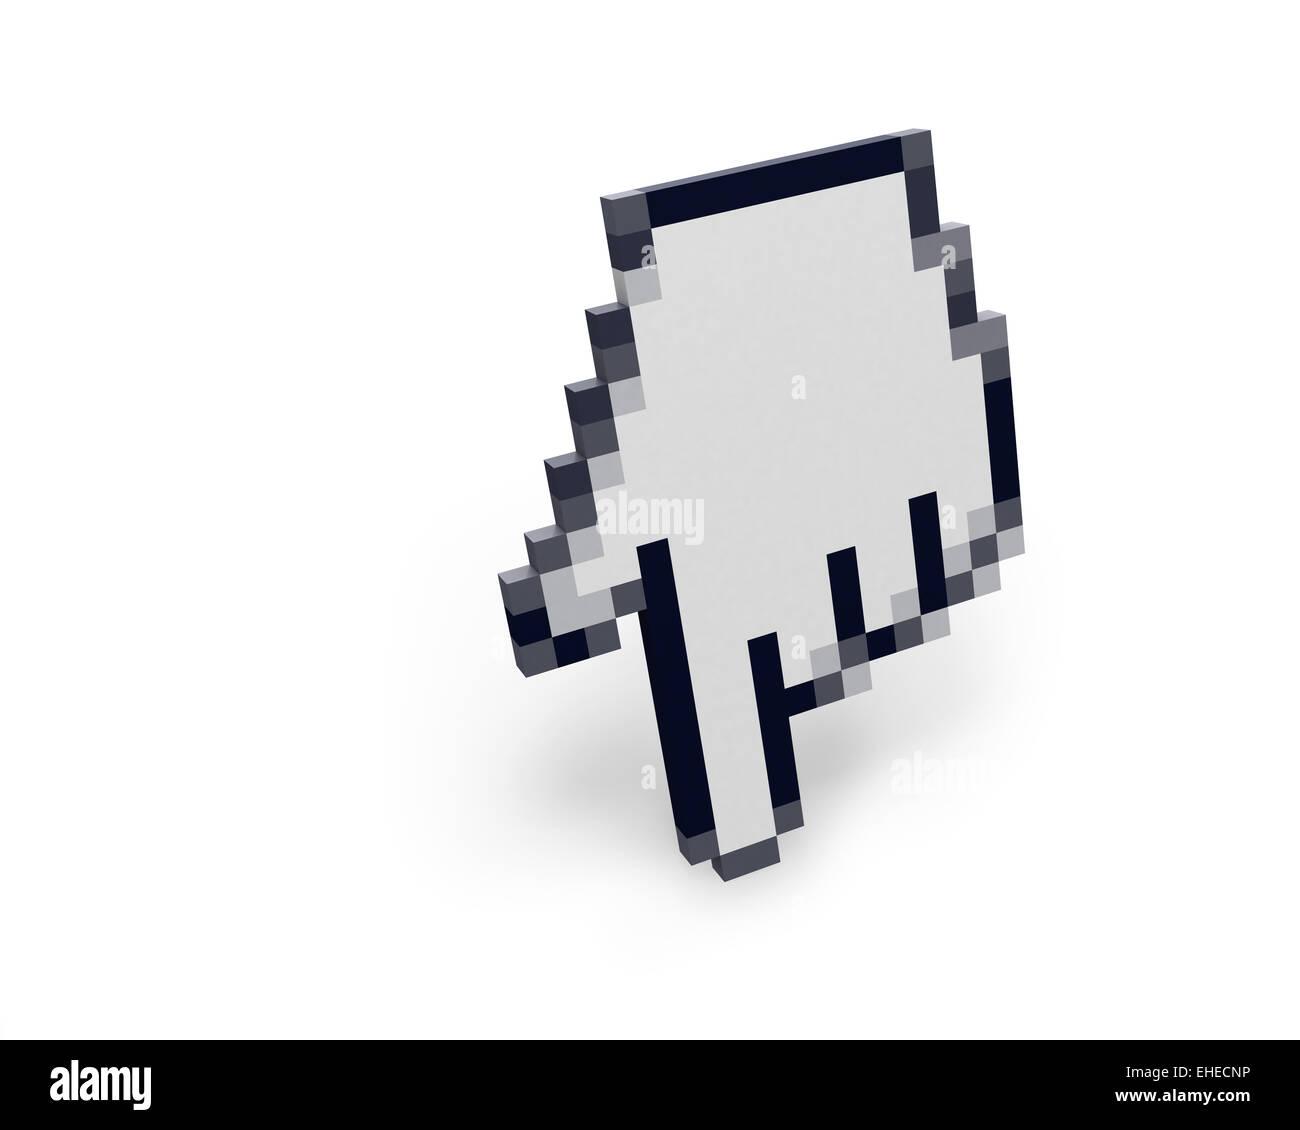 Hand cursor standing left view - Stock Image